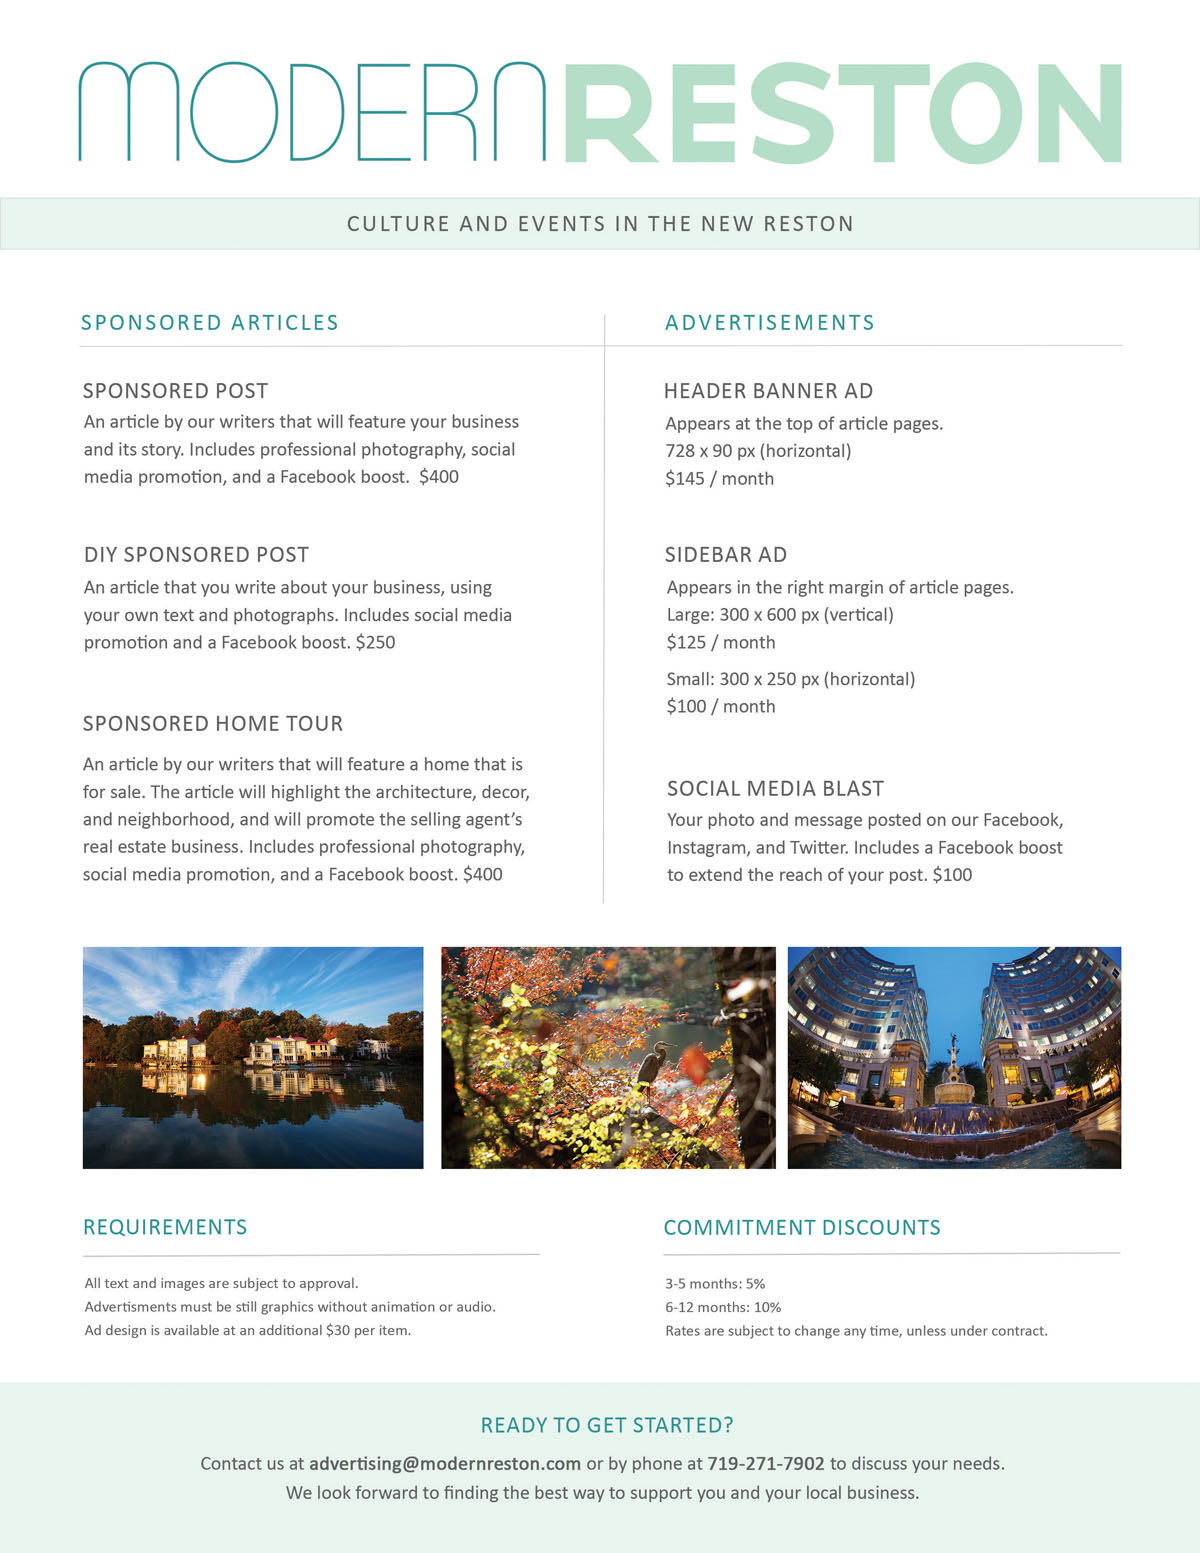 2016-Modern-Reston-media-kit-2